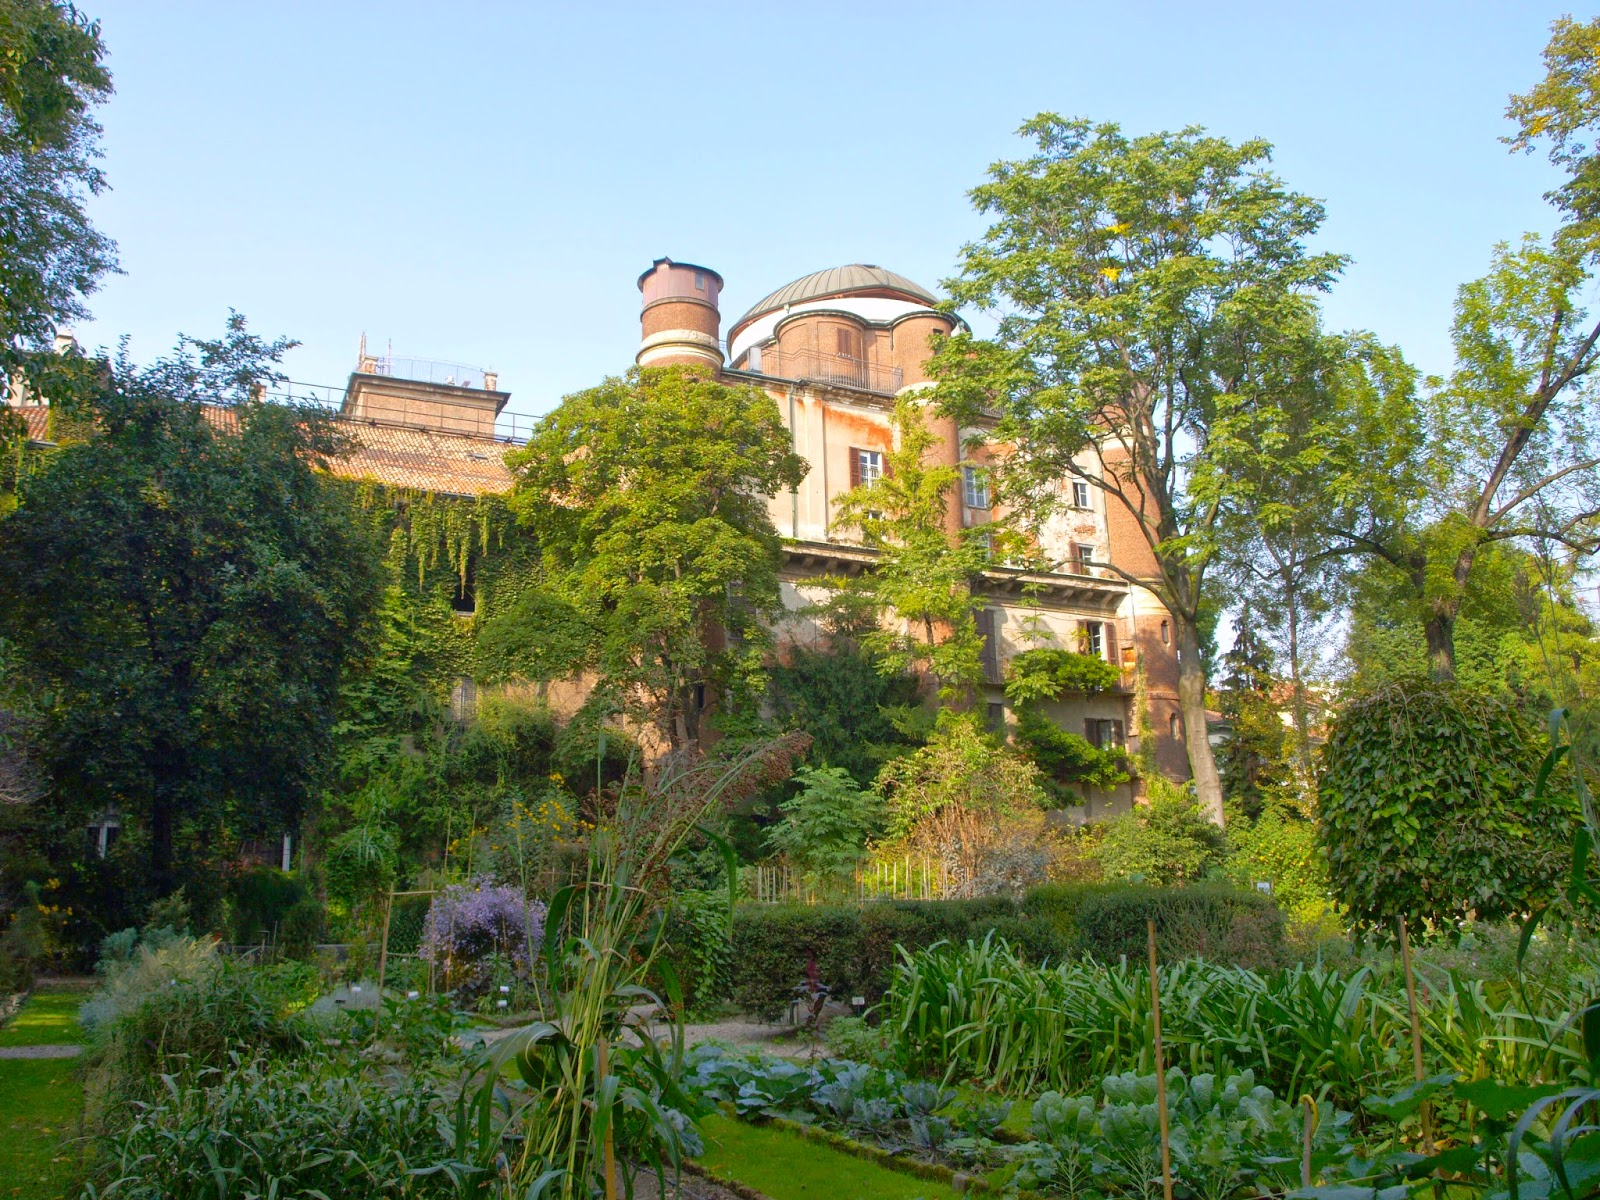 Unfashionable orto botanico di brera milano for Giardino botanico milano